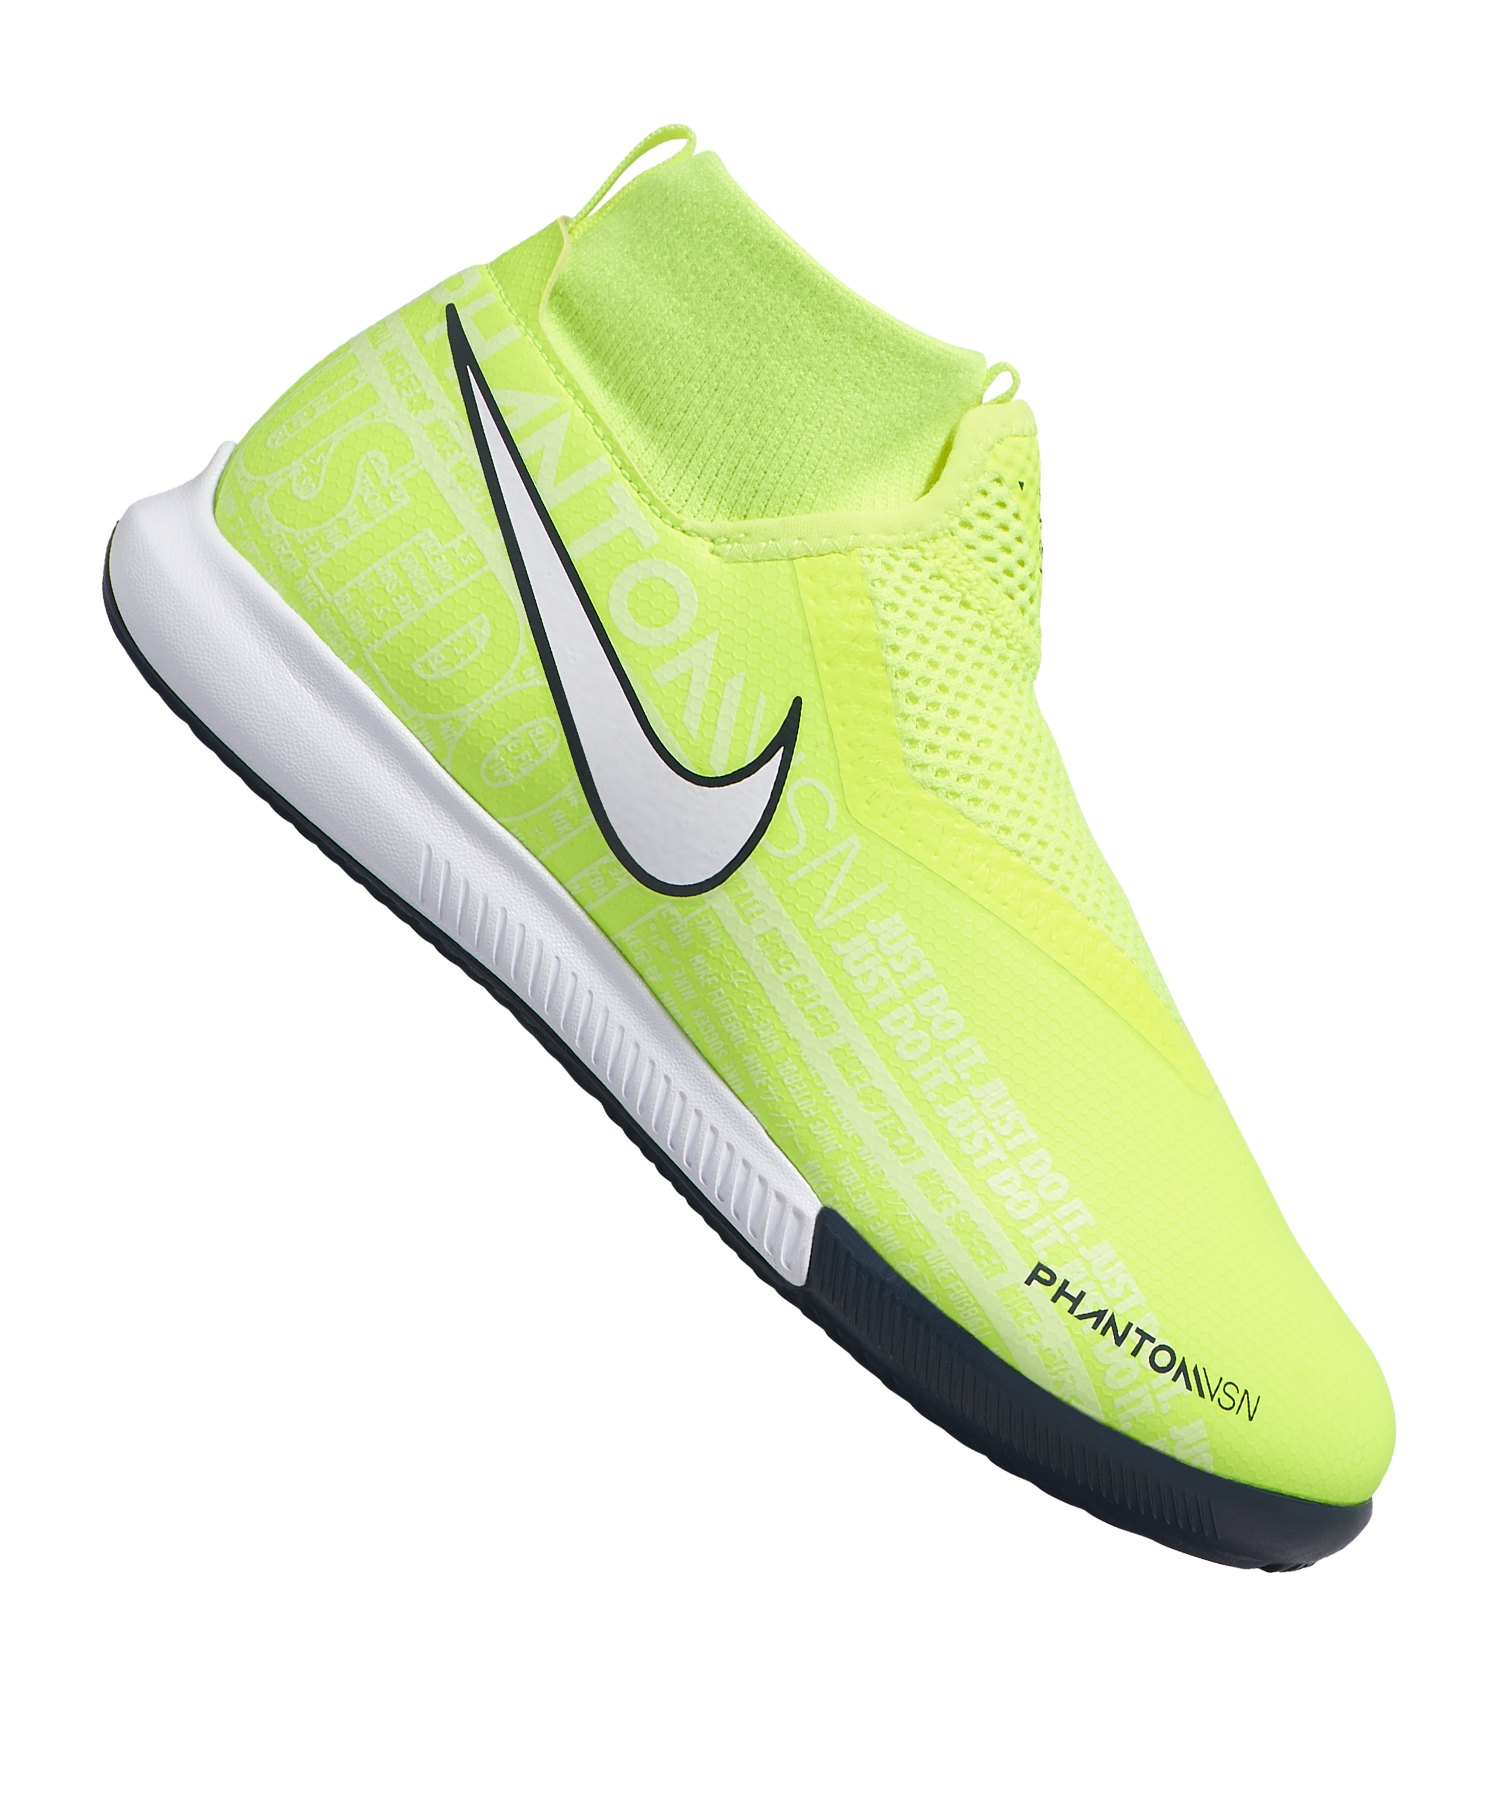 F717 Ic Nike Vision Phantom Df Kids Gelb Academy dQrBoxhtsC